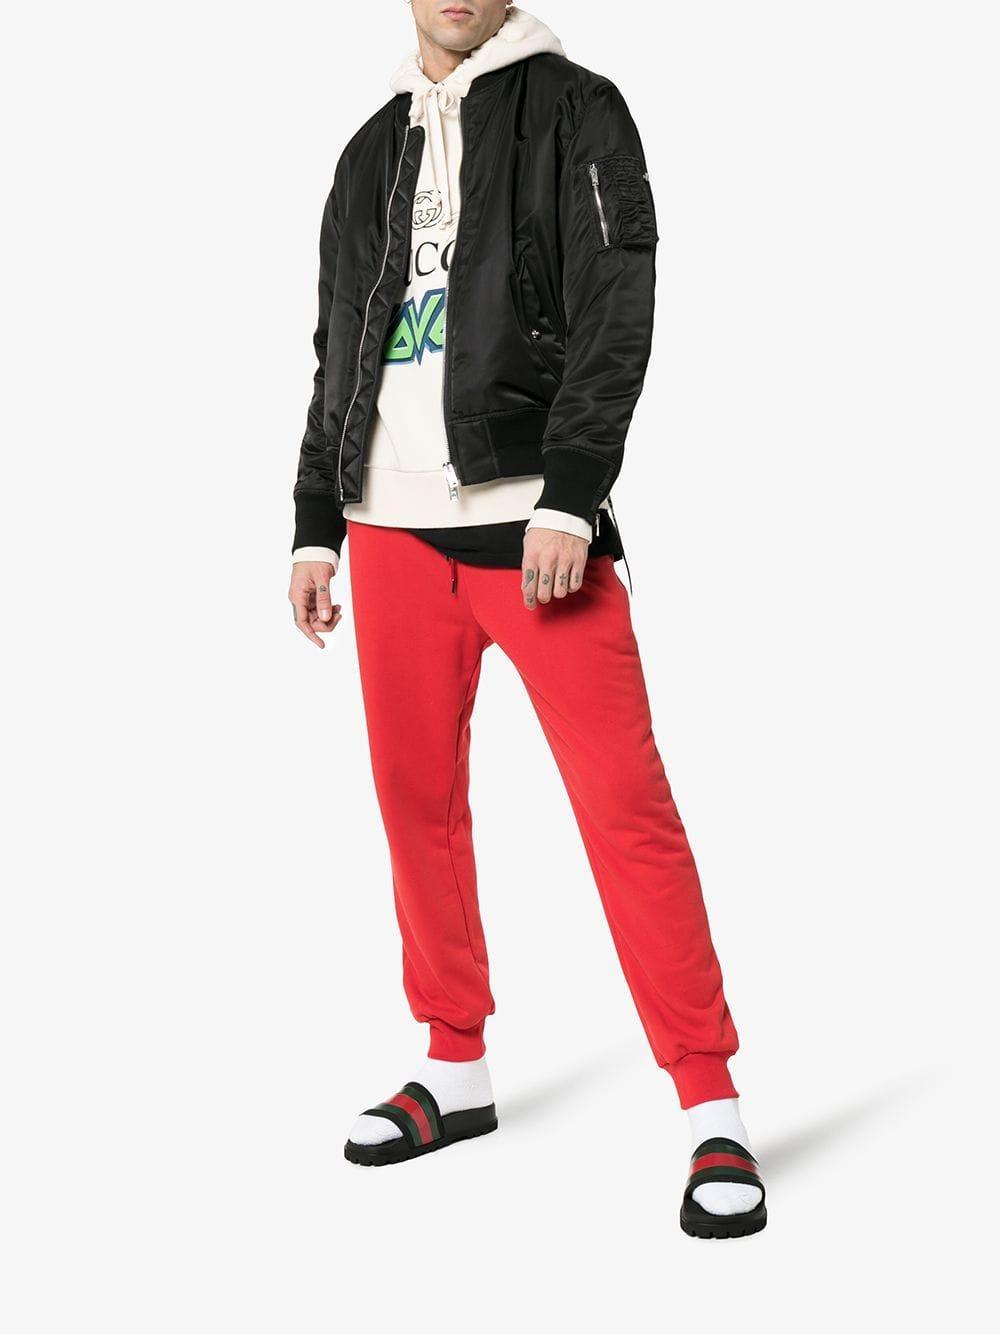 8dec7cabd Lyst - Gucci Black Pursuit Web Slides in Black for Men - Save 13%